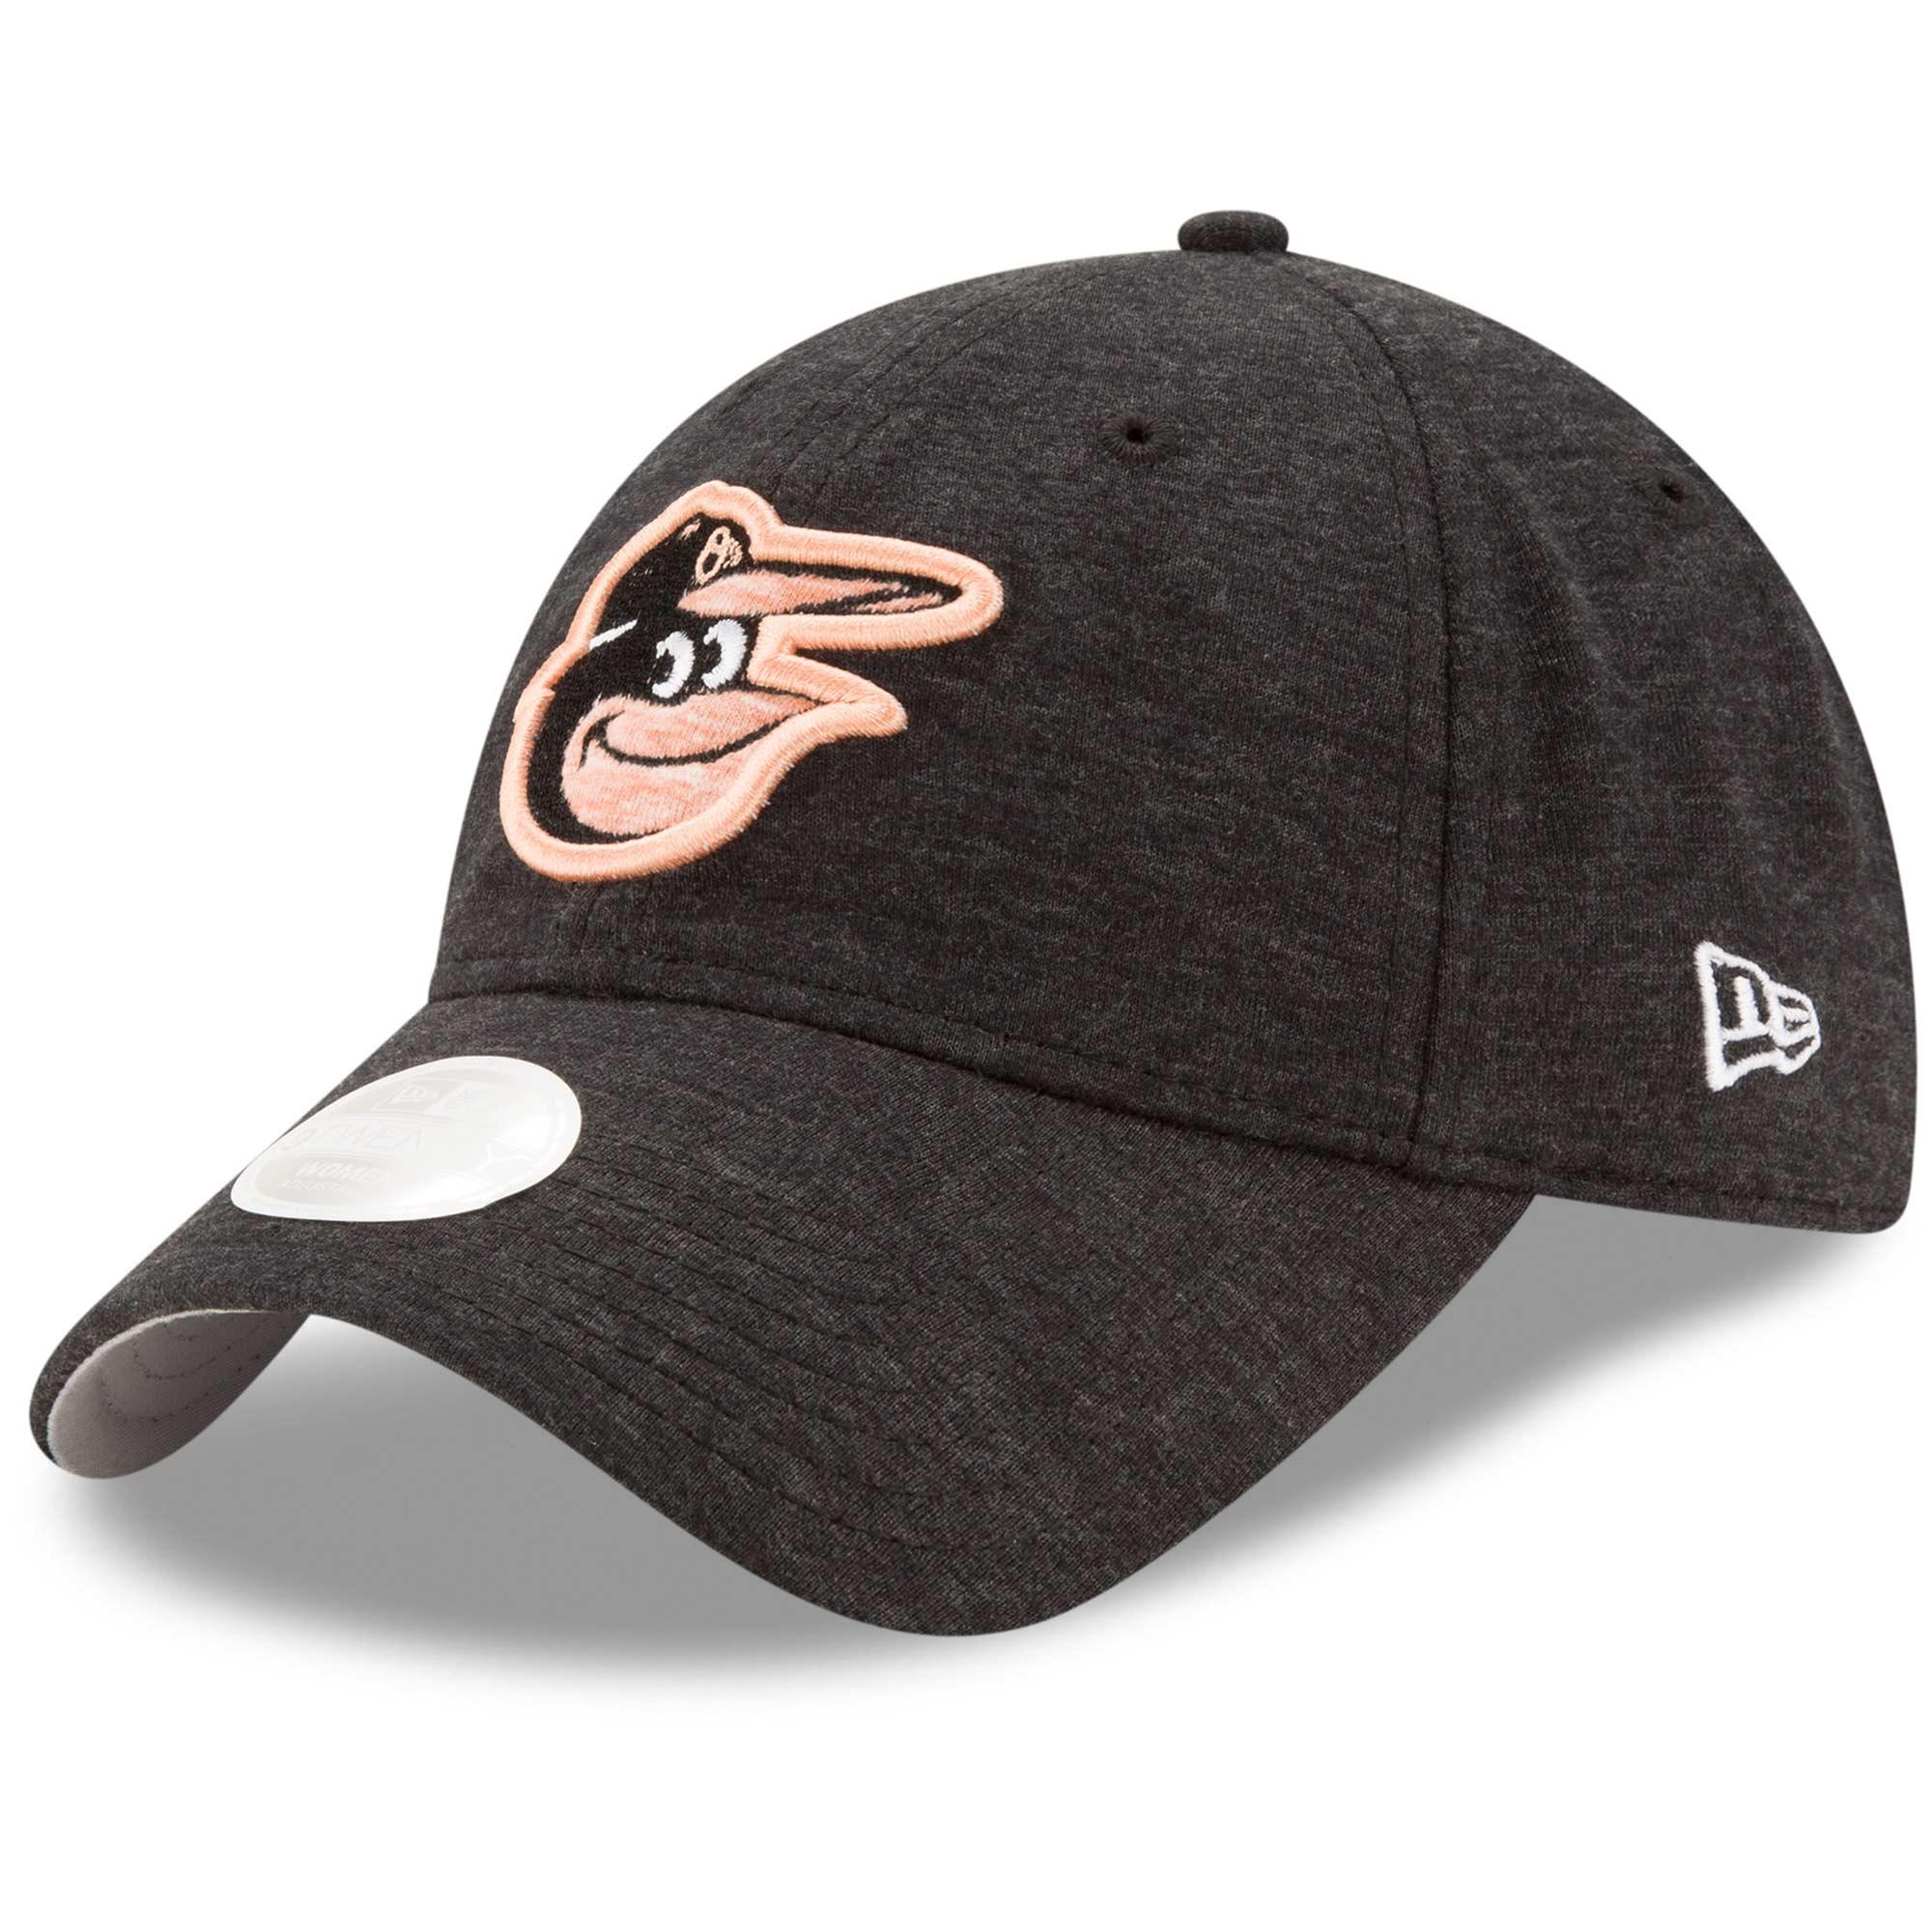 Baltimore Orioles New Era Women's Team Multi Tone 9TWENTY Adjustable Hat - Black - OSFA